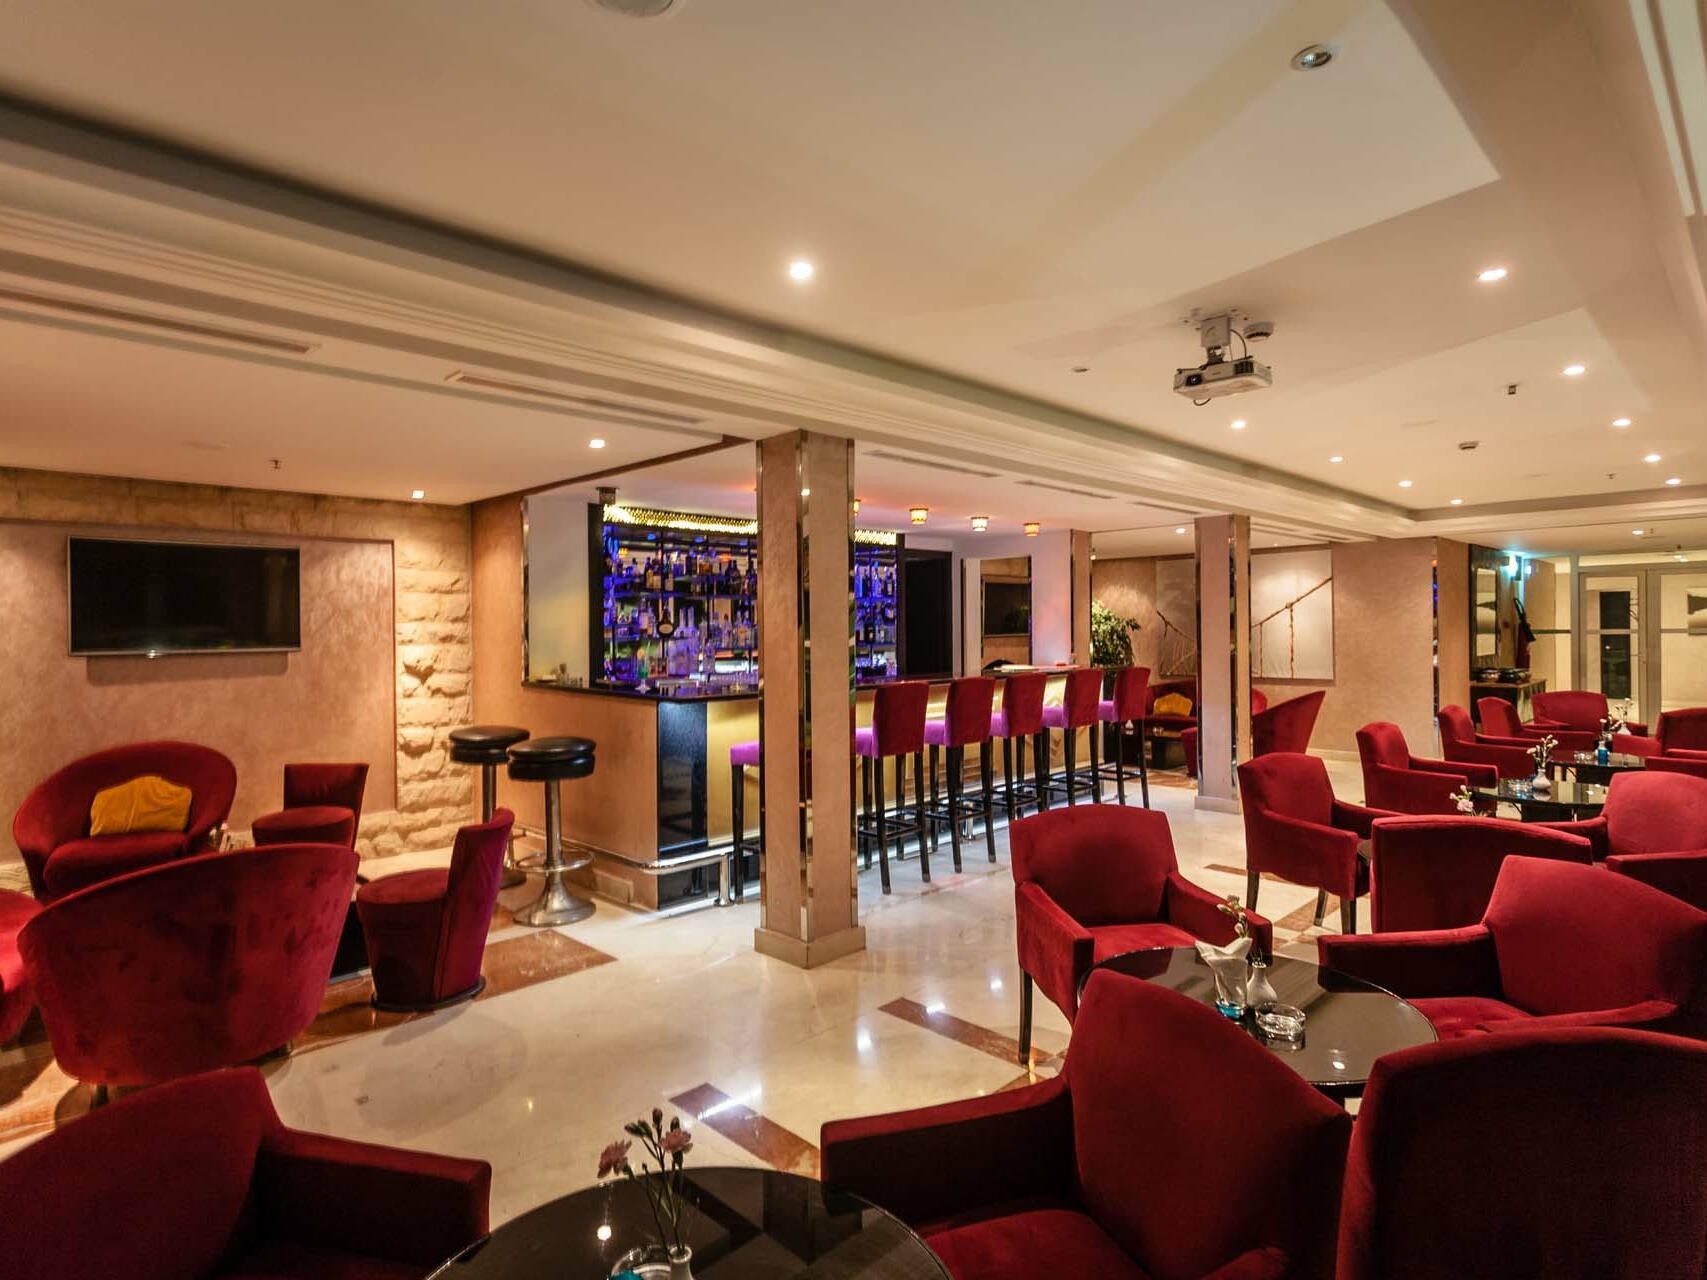 Comfortable Chair - Farah Rabat Hotel